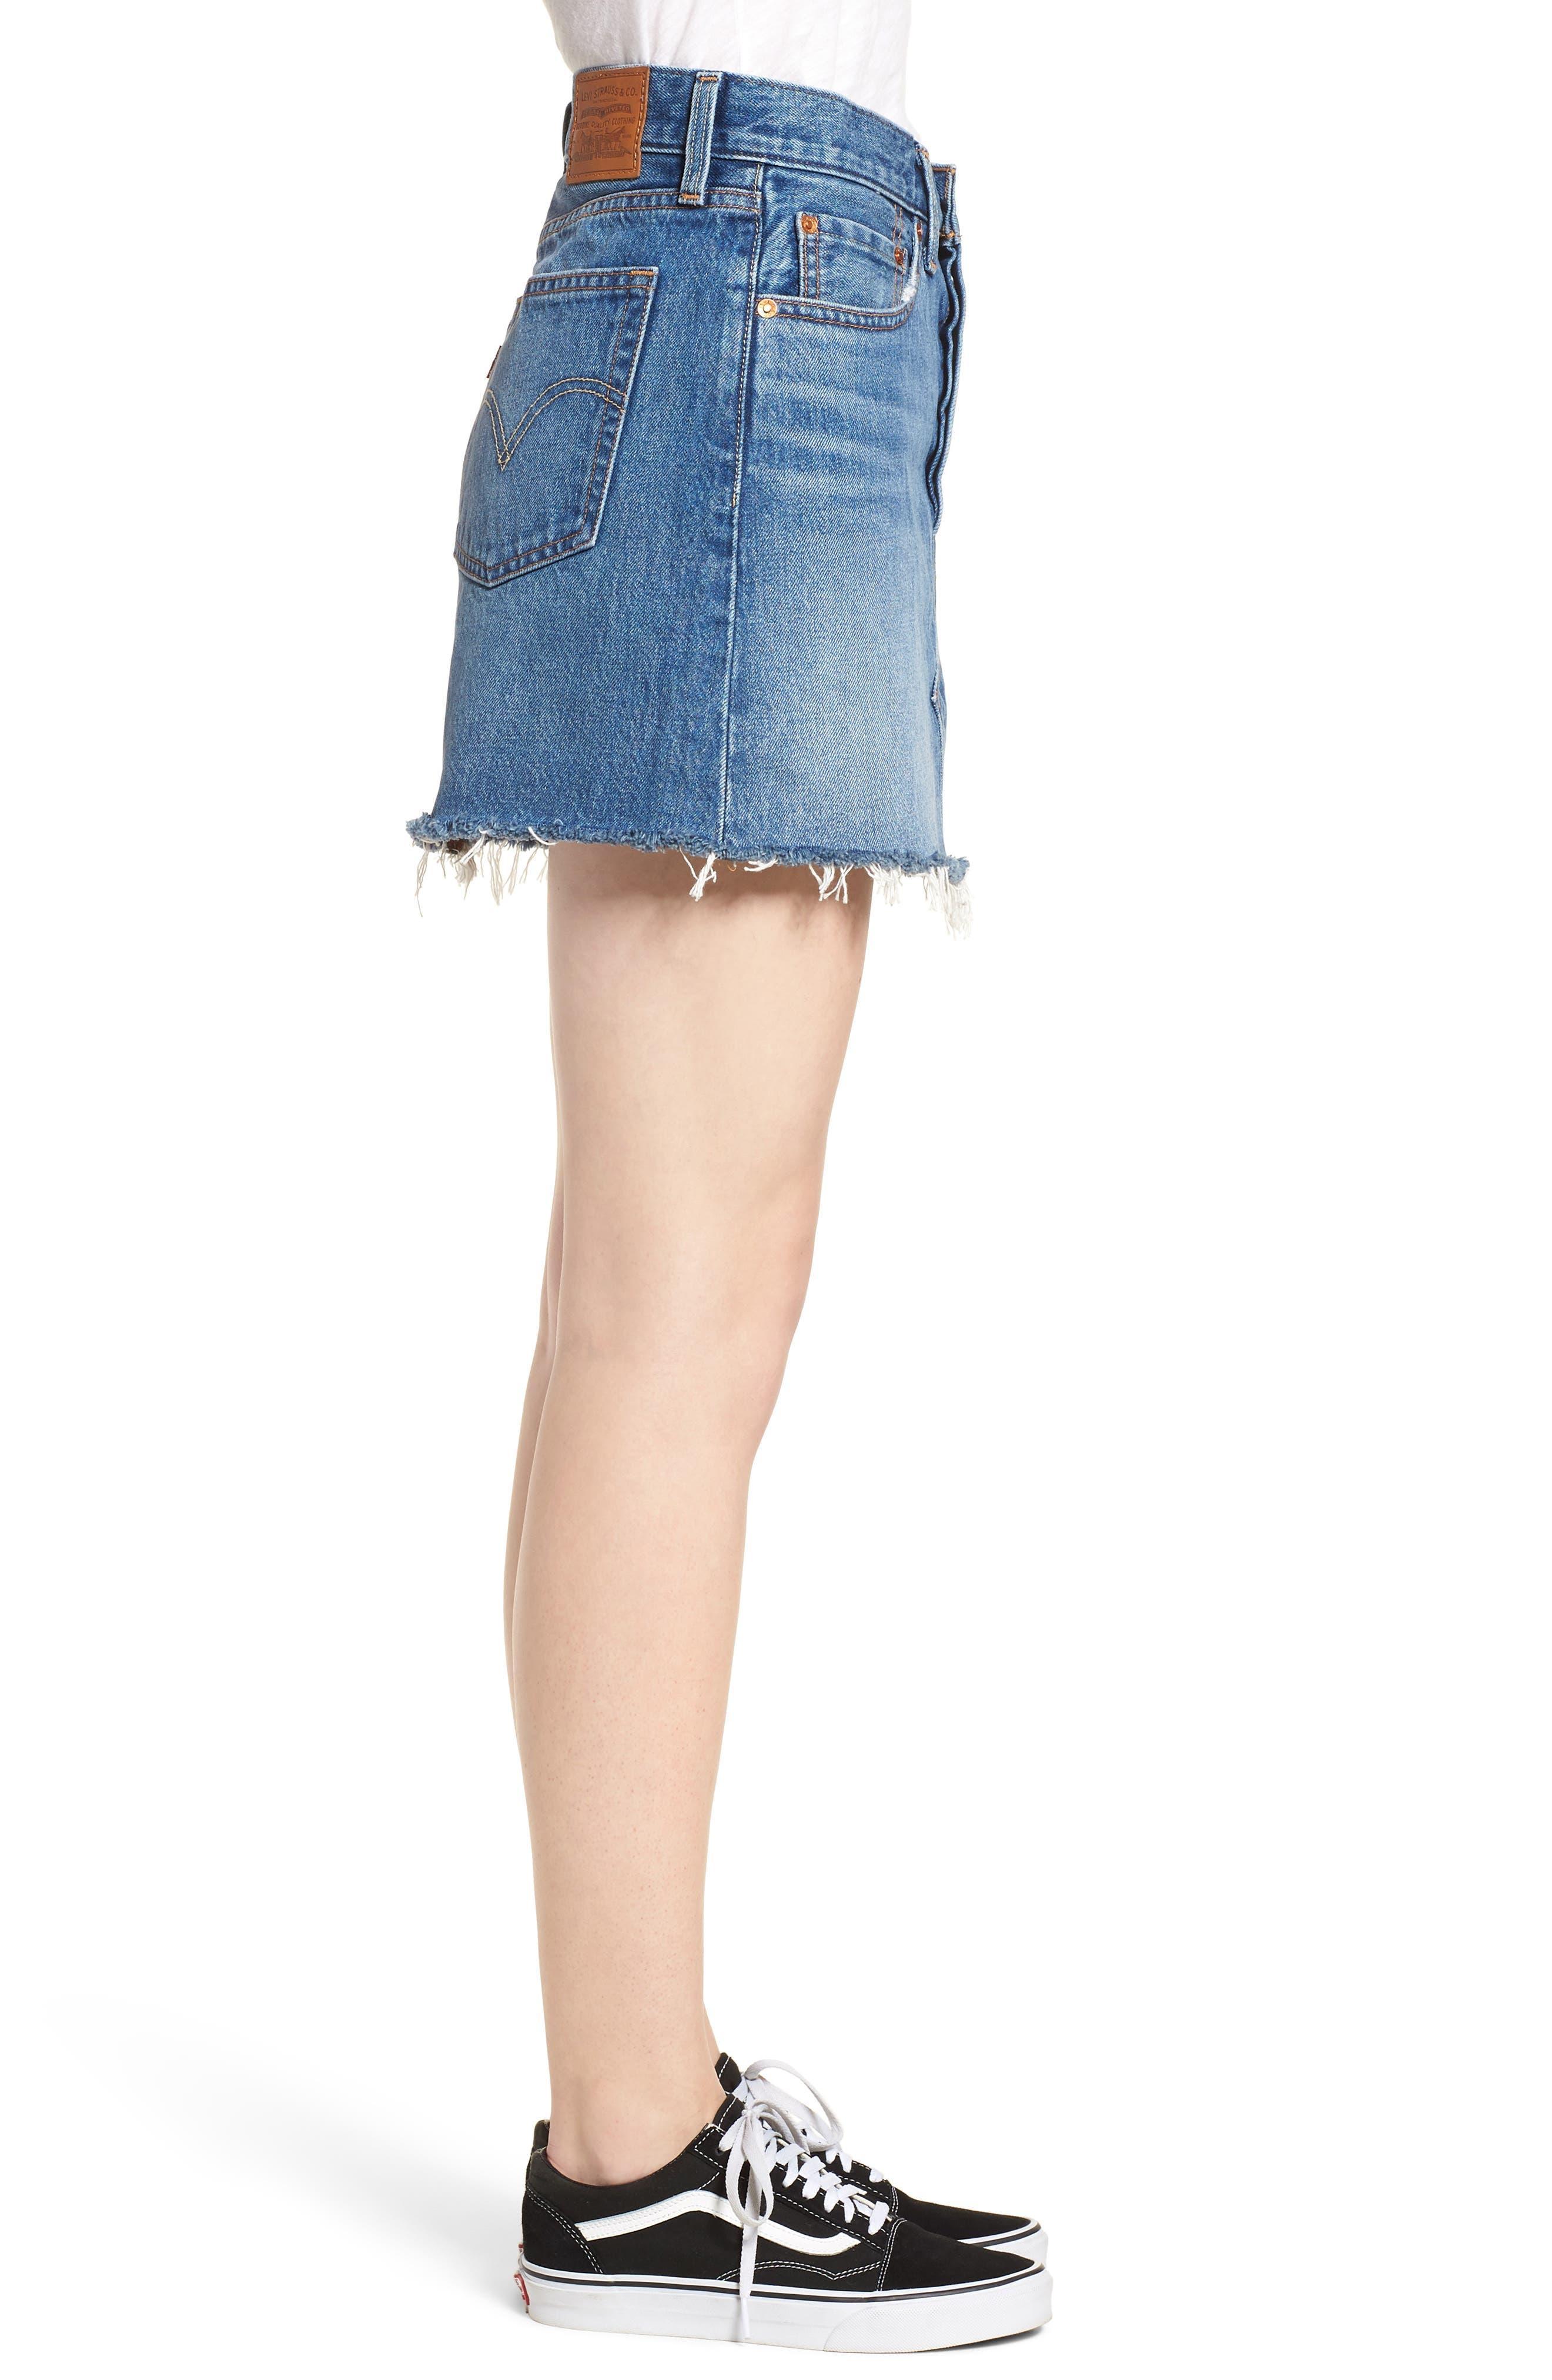 LEVI'S<SUP>®</SUP>, Deconstructed Denim Skirt, Alternate thumbnail 4, color, MIDDLE MAN